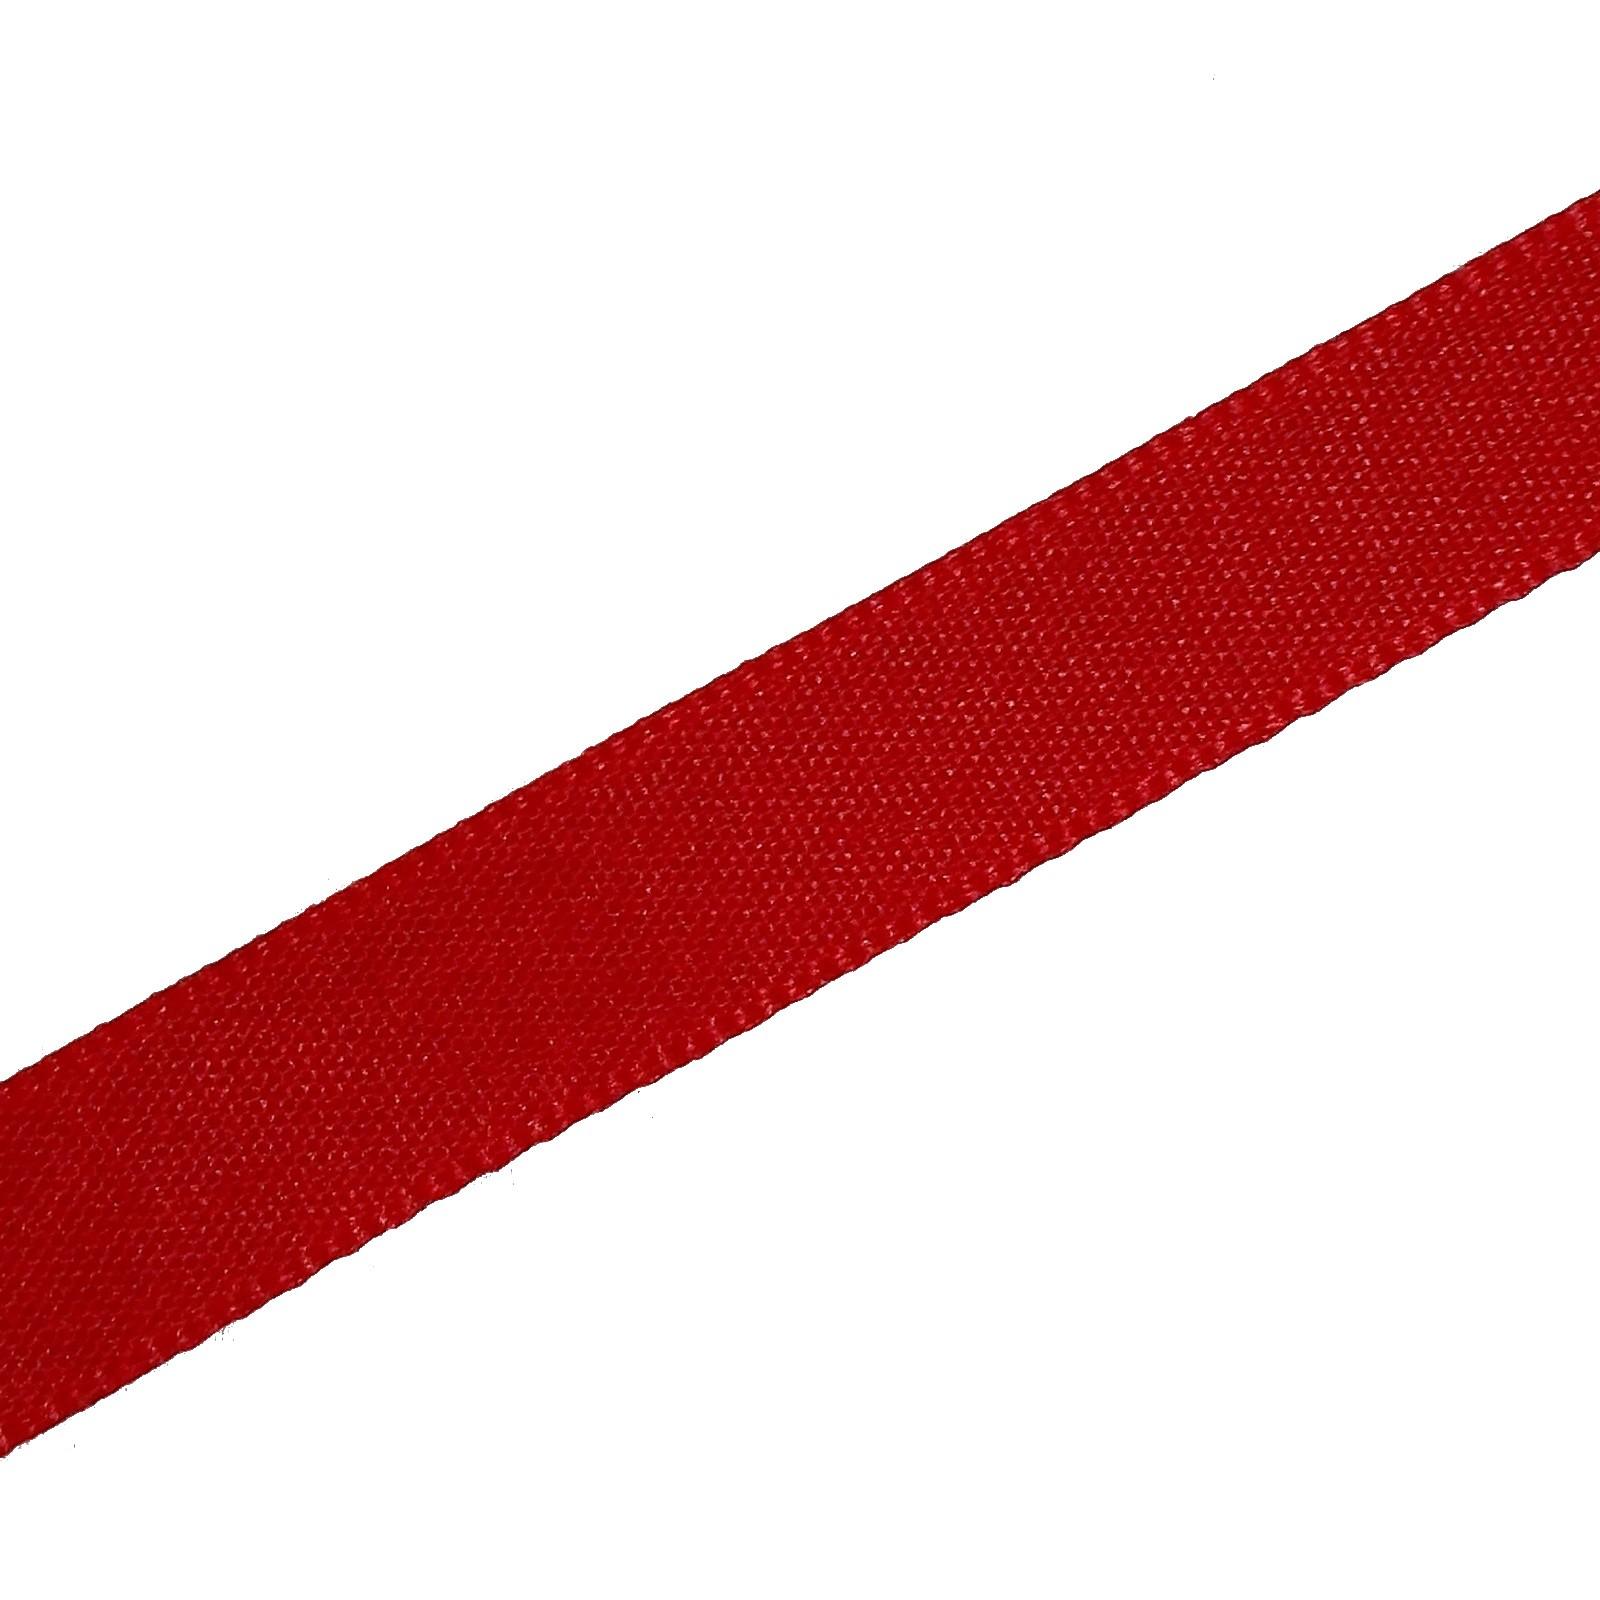 Berisfords Seam Binding Polyester Ribbon Tape 12mm wide Red 2 metre length